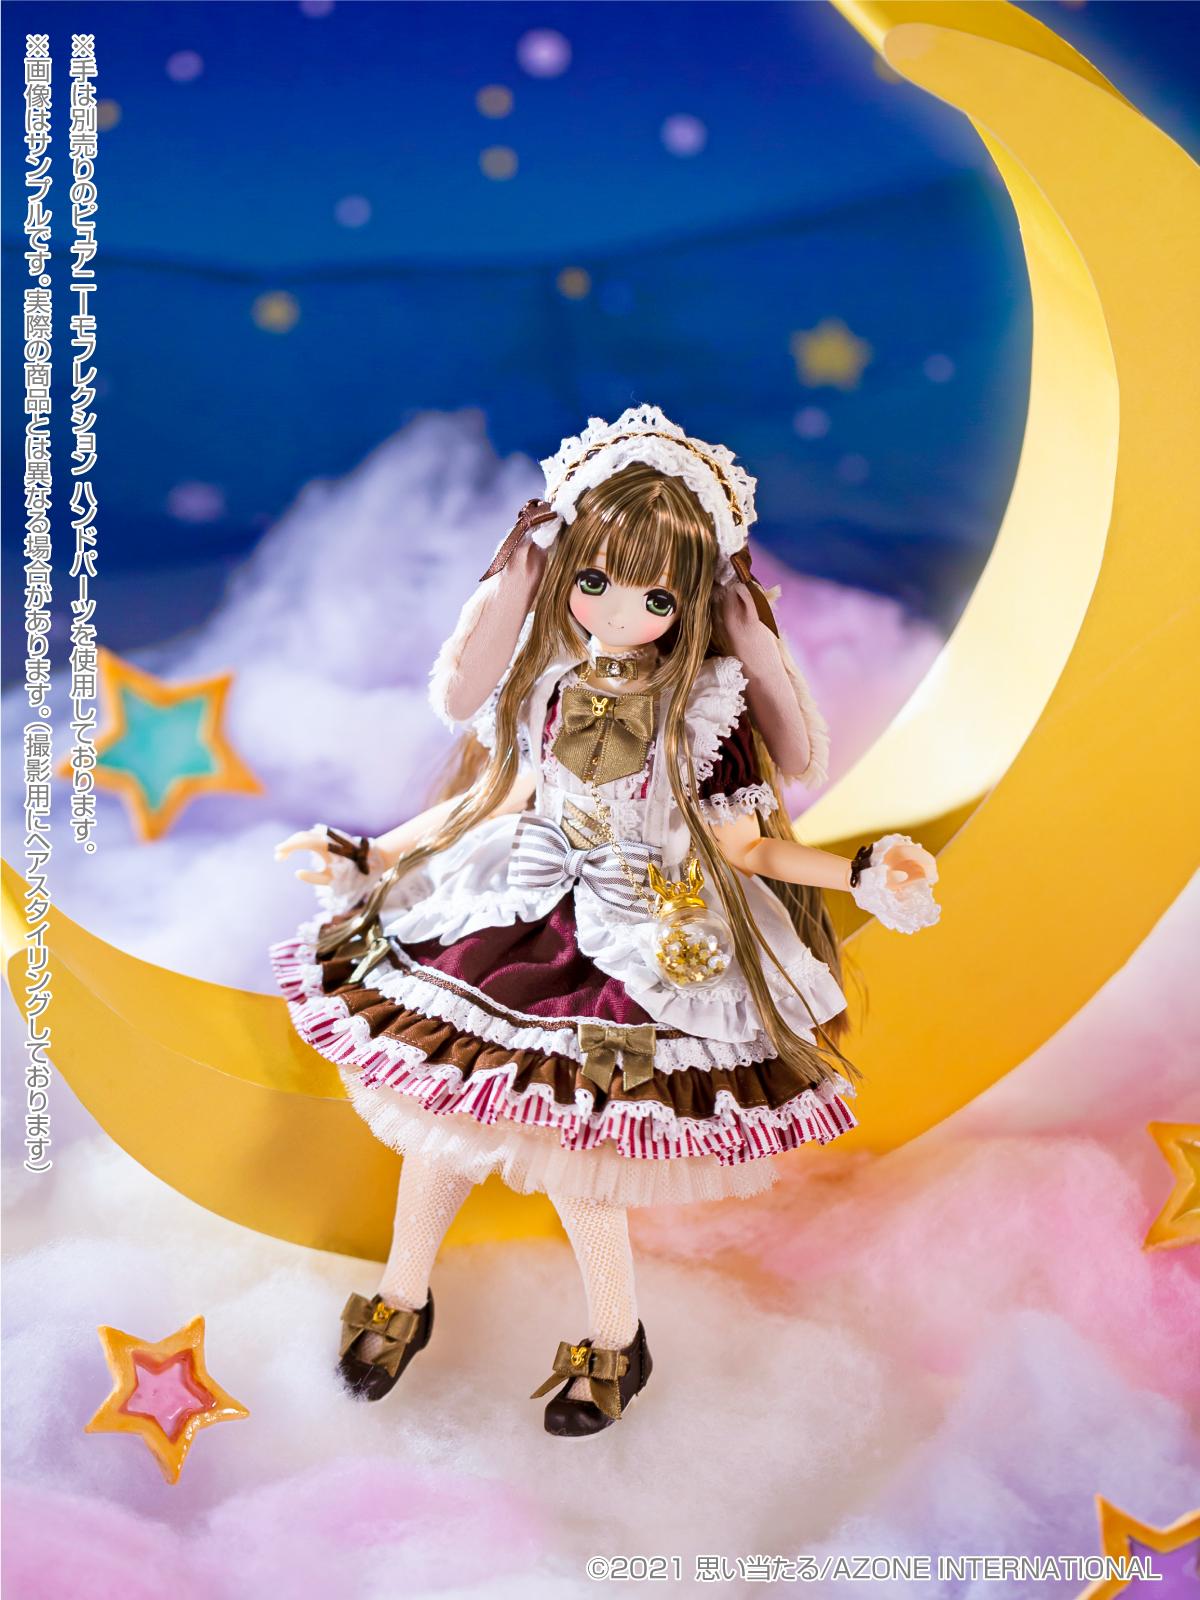 Star Sprinkles『Moon Rabbit Miu/ムーンラビット 月兎 みう』えっくす☆きゅーと 1/6 完成品ドール-012